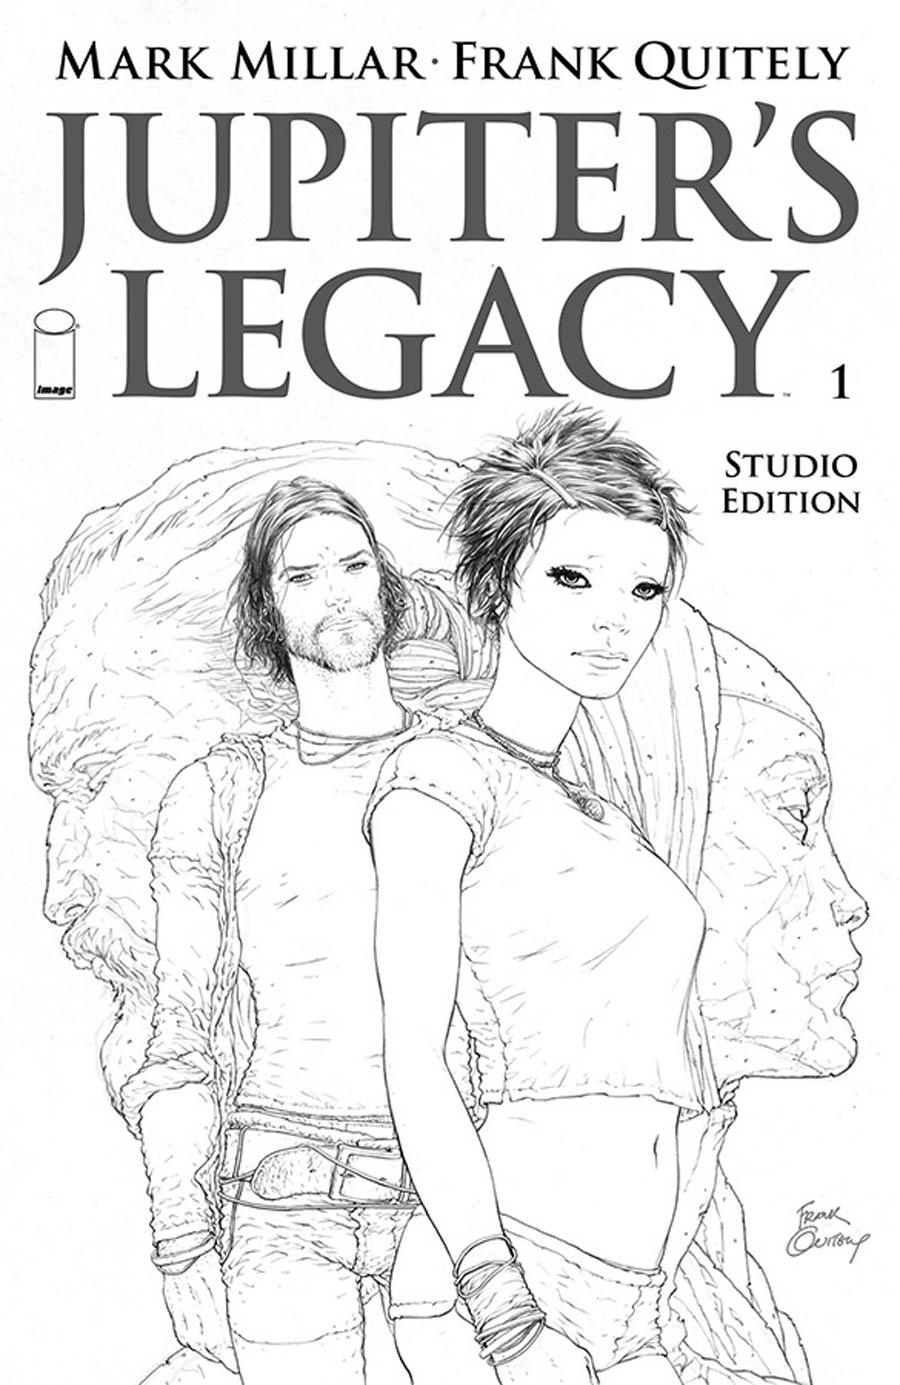 Jupiters Legacy #1 Cover K Studio Edition